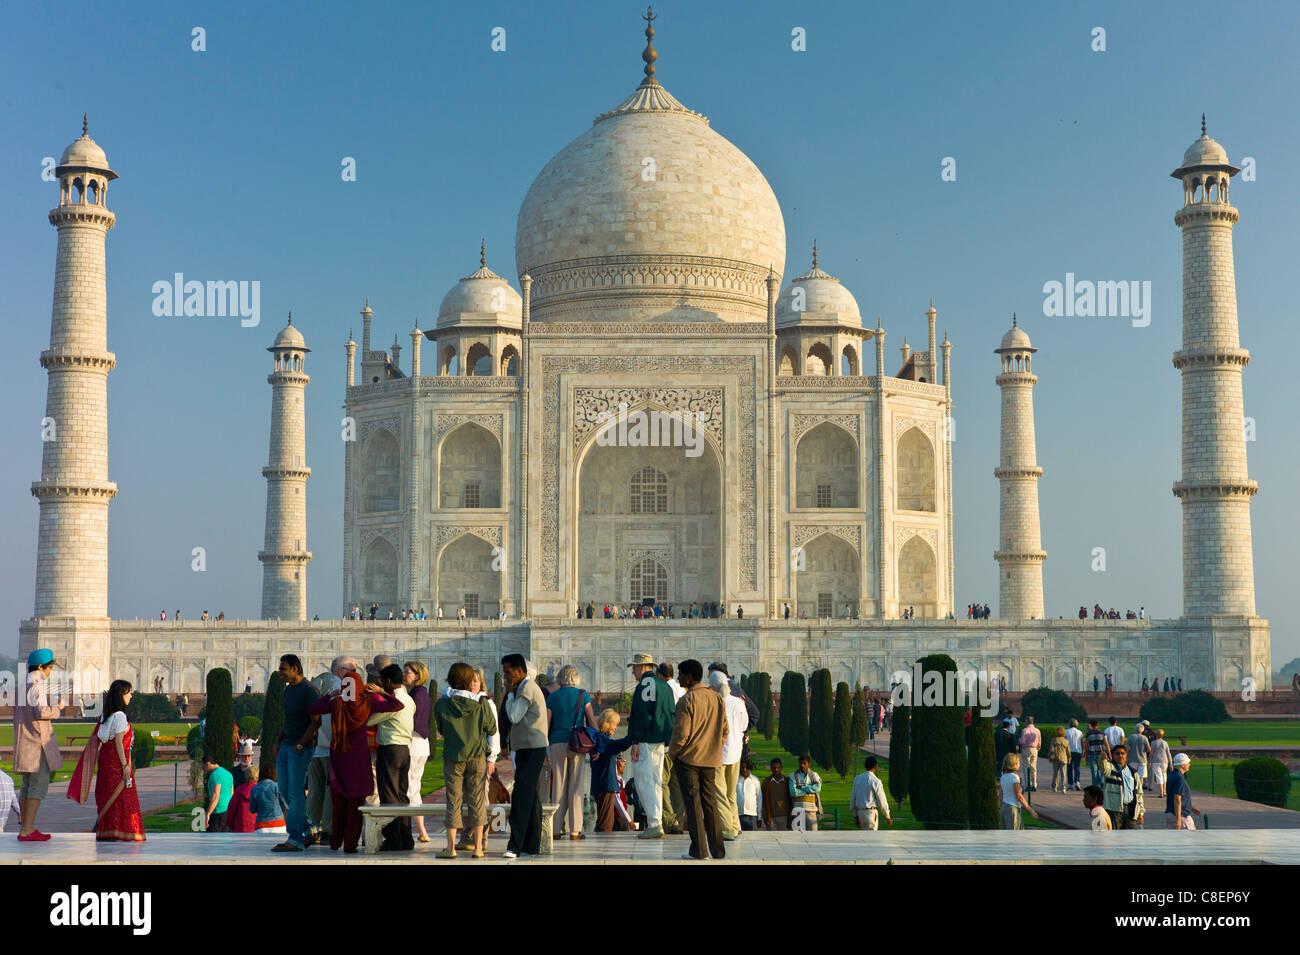 Los turistas en el Taj Mahal mausoleo vista meridional de Uttar Pradesh, India Foto de stock